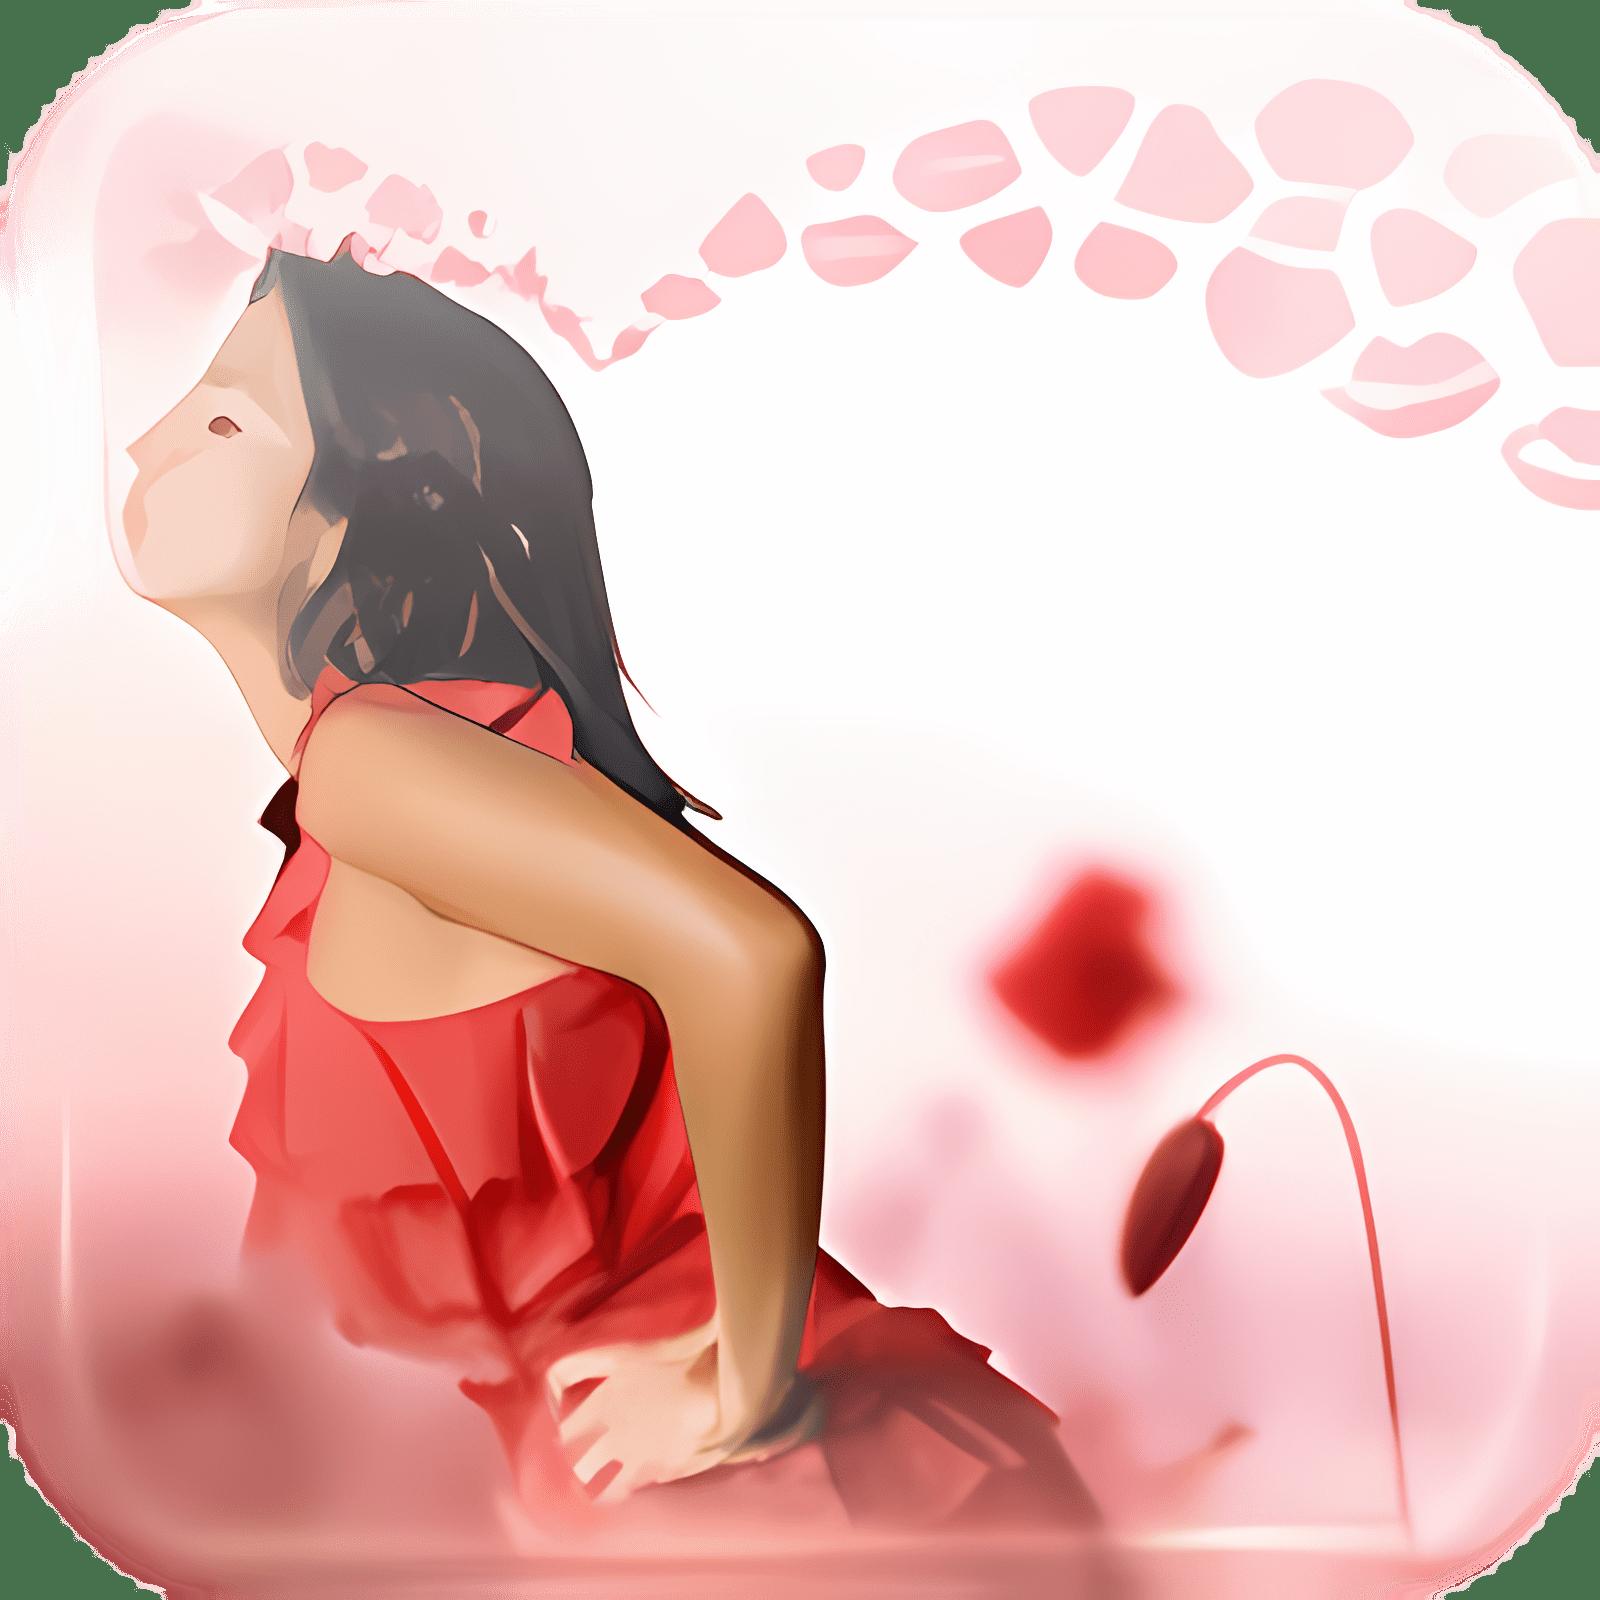 Ivete Sangalo - Na base do beijo (Papel de parede para Twitter)